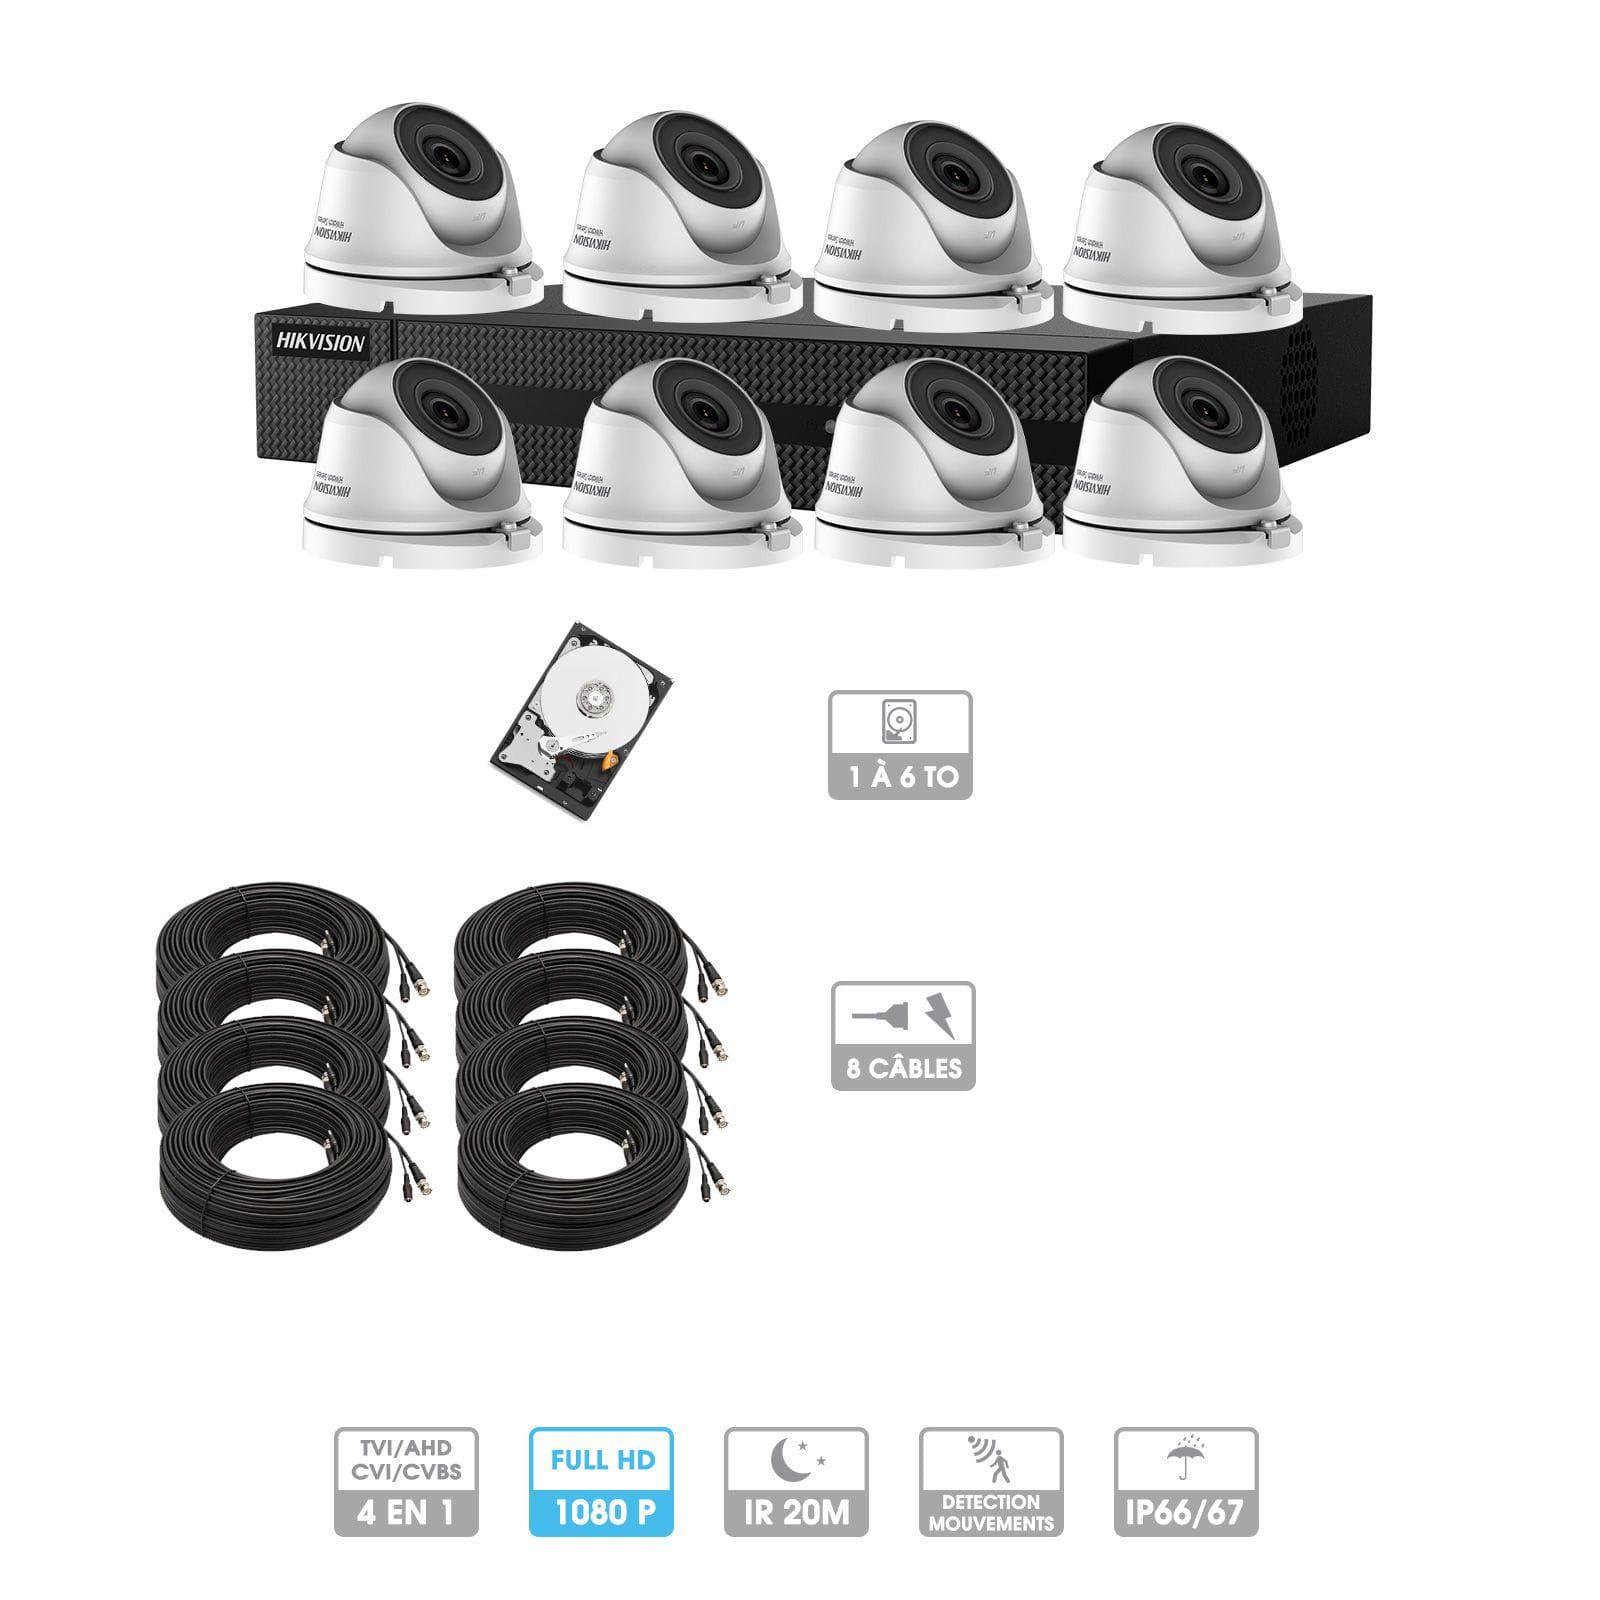 Kit vidéosurveillance 8 caméras 1080P HD | 8 câbles 20 mètres | HDD 1To | Dômes Hiwatch